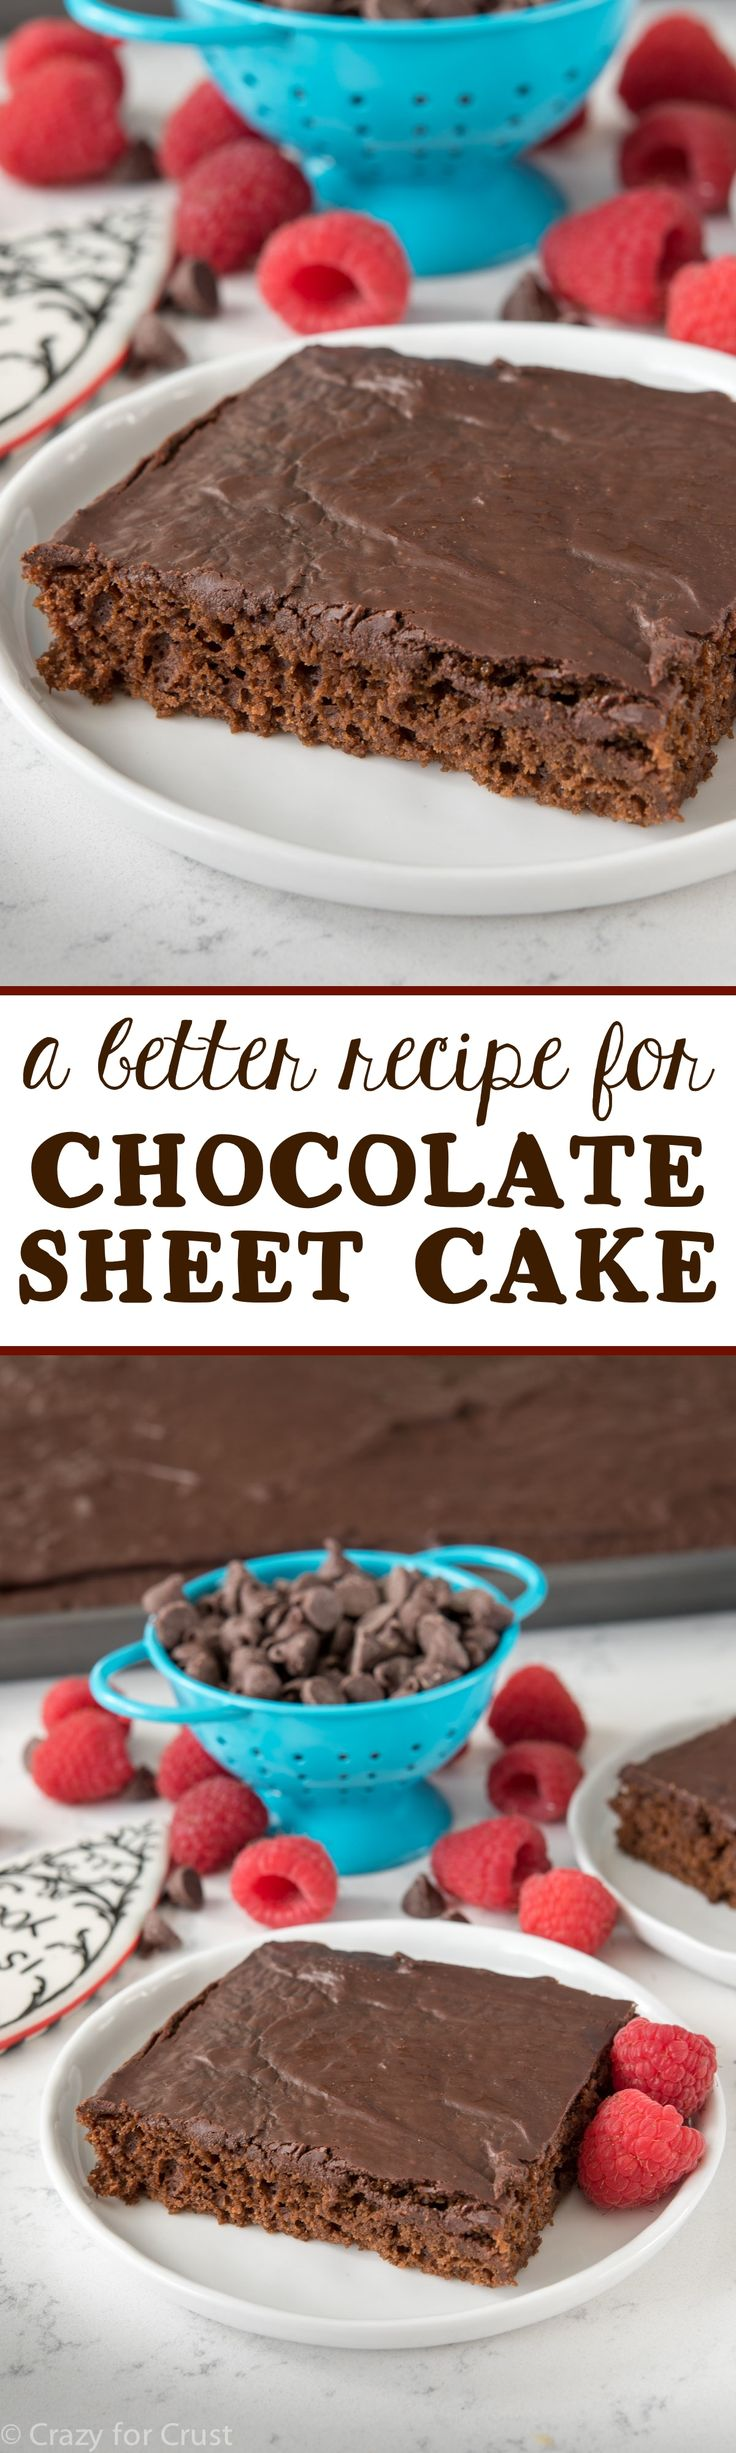 ... Sheet Cakes / Squares on Pinterest | Cakes, Mayonnaise chocolate cakes